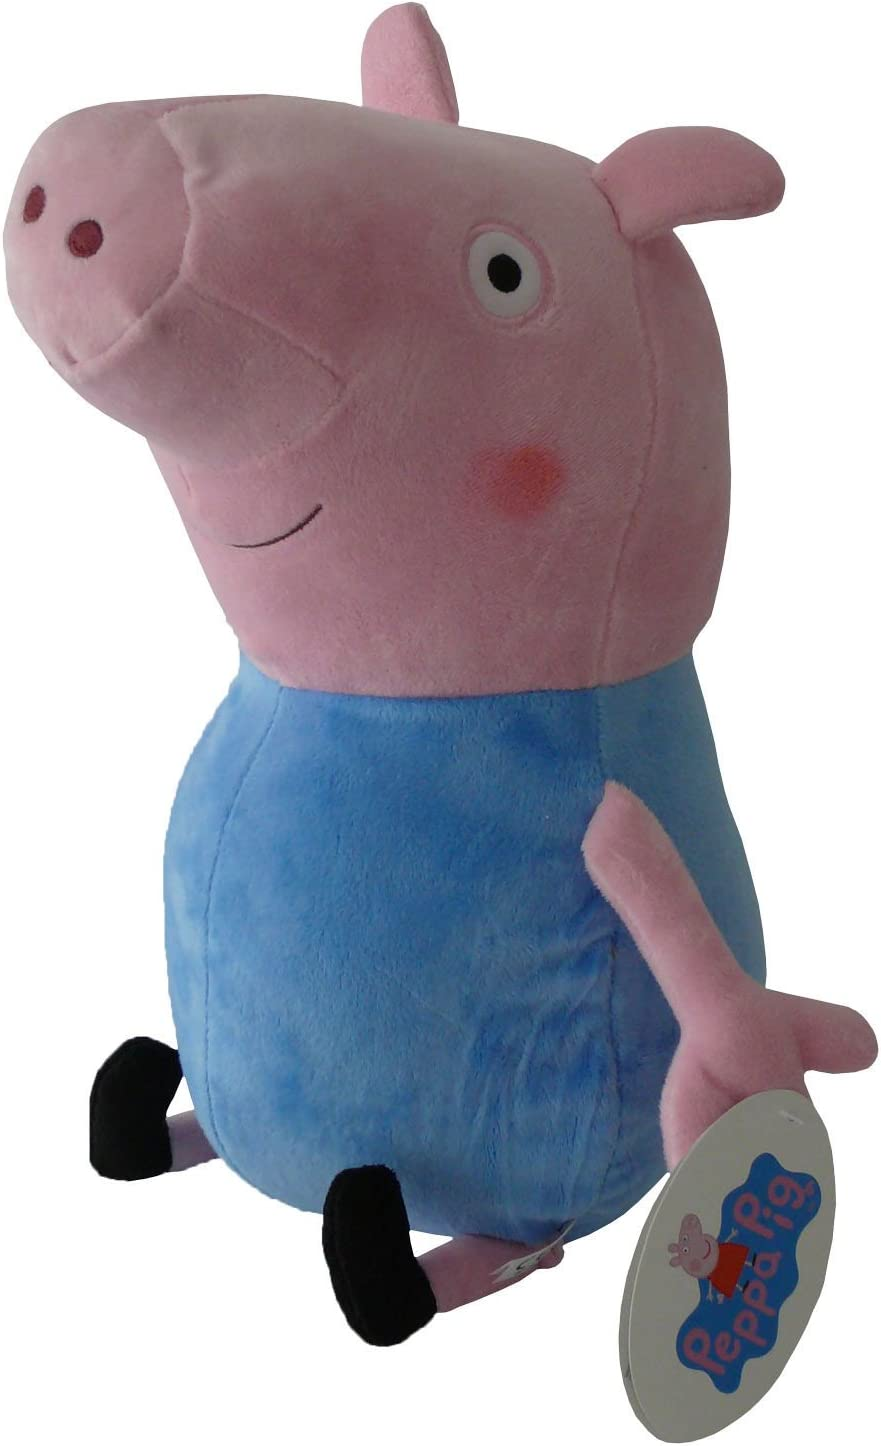 Peppa Pig - George Clásico 27cm Calidad super soft - Peluche - Ouast